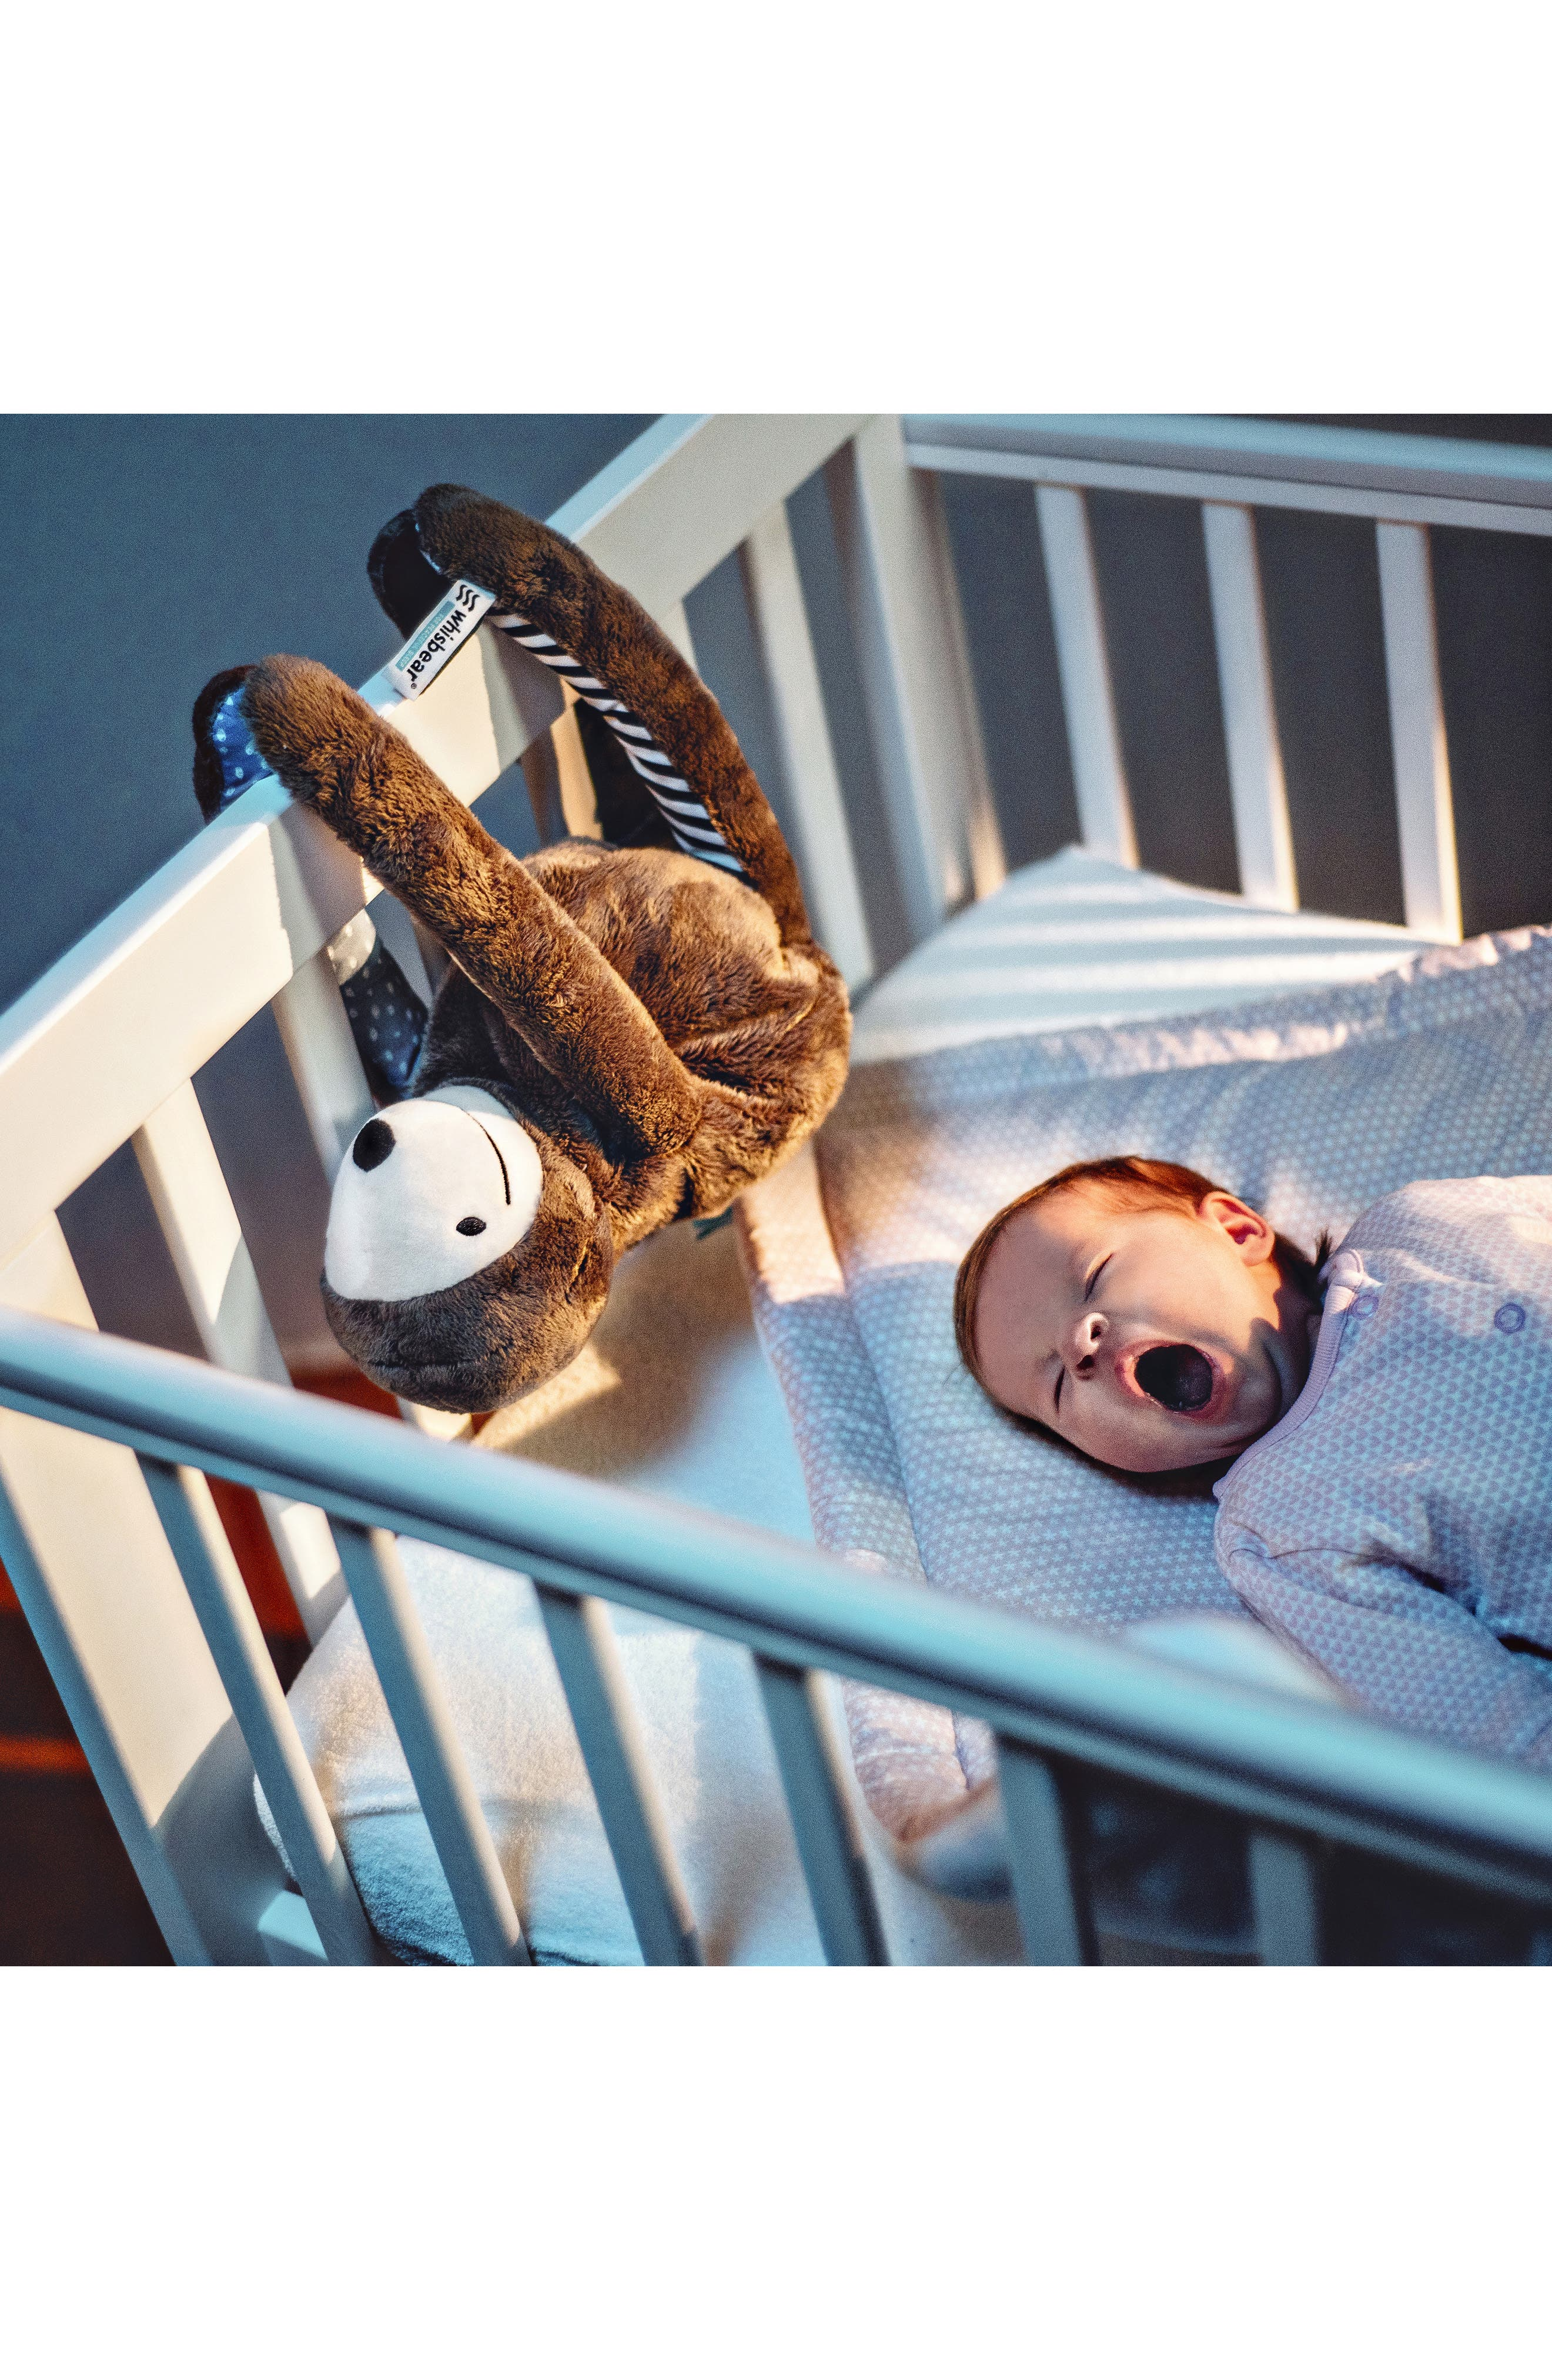 ,                             E-zzy the Sloth Baby Sleep Machine,                             Alternate thumbnail 5, color,                             200